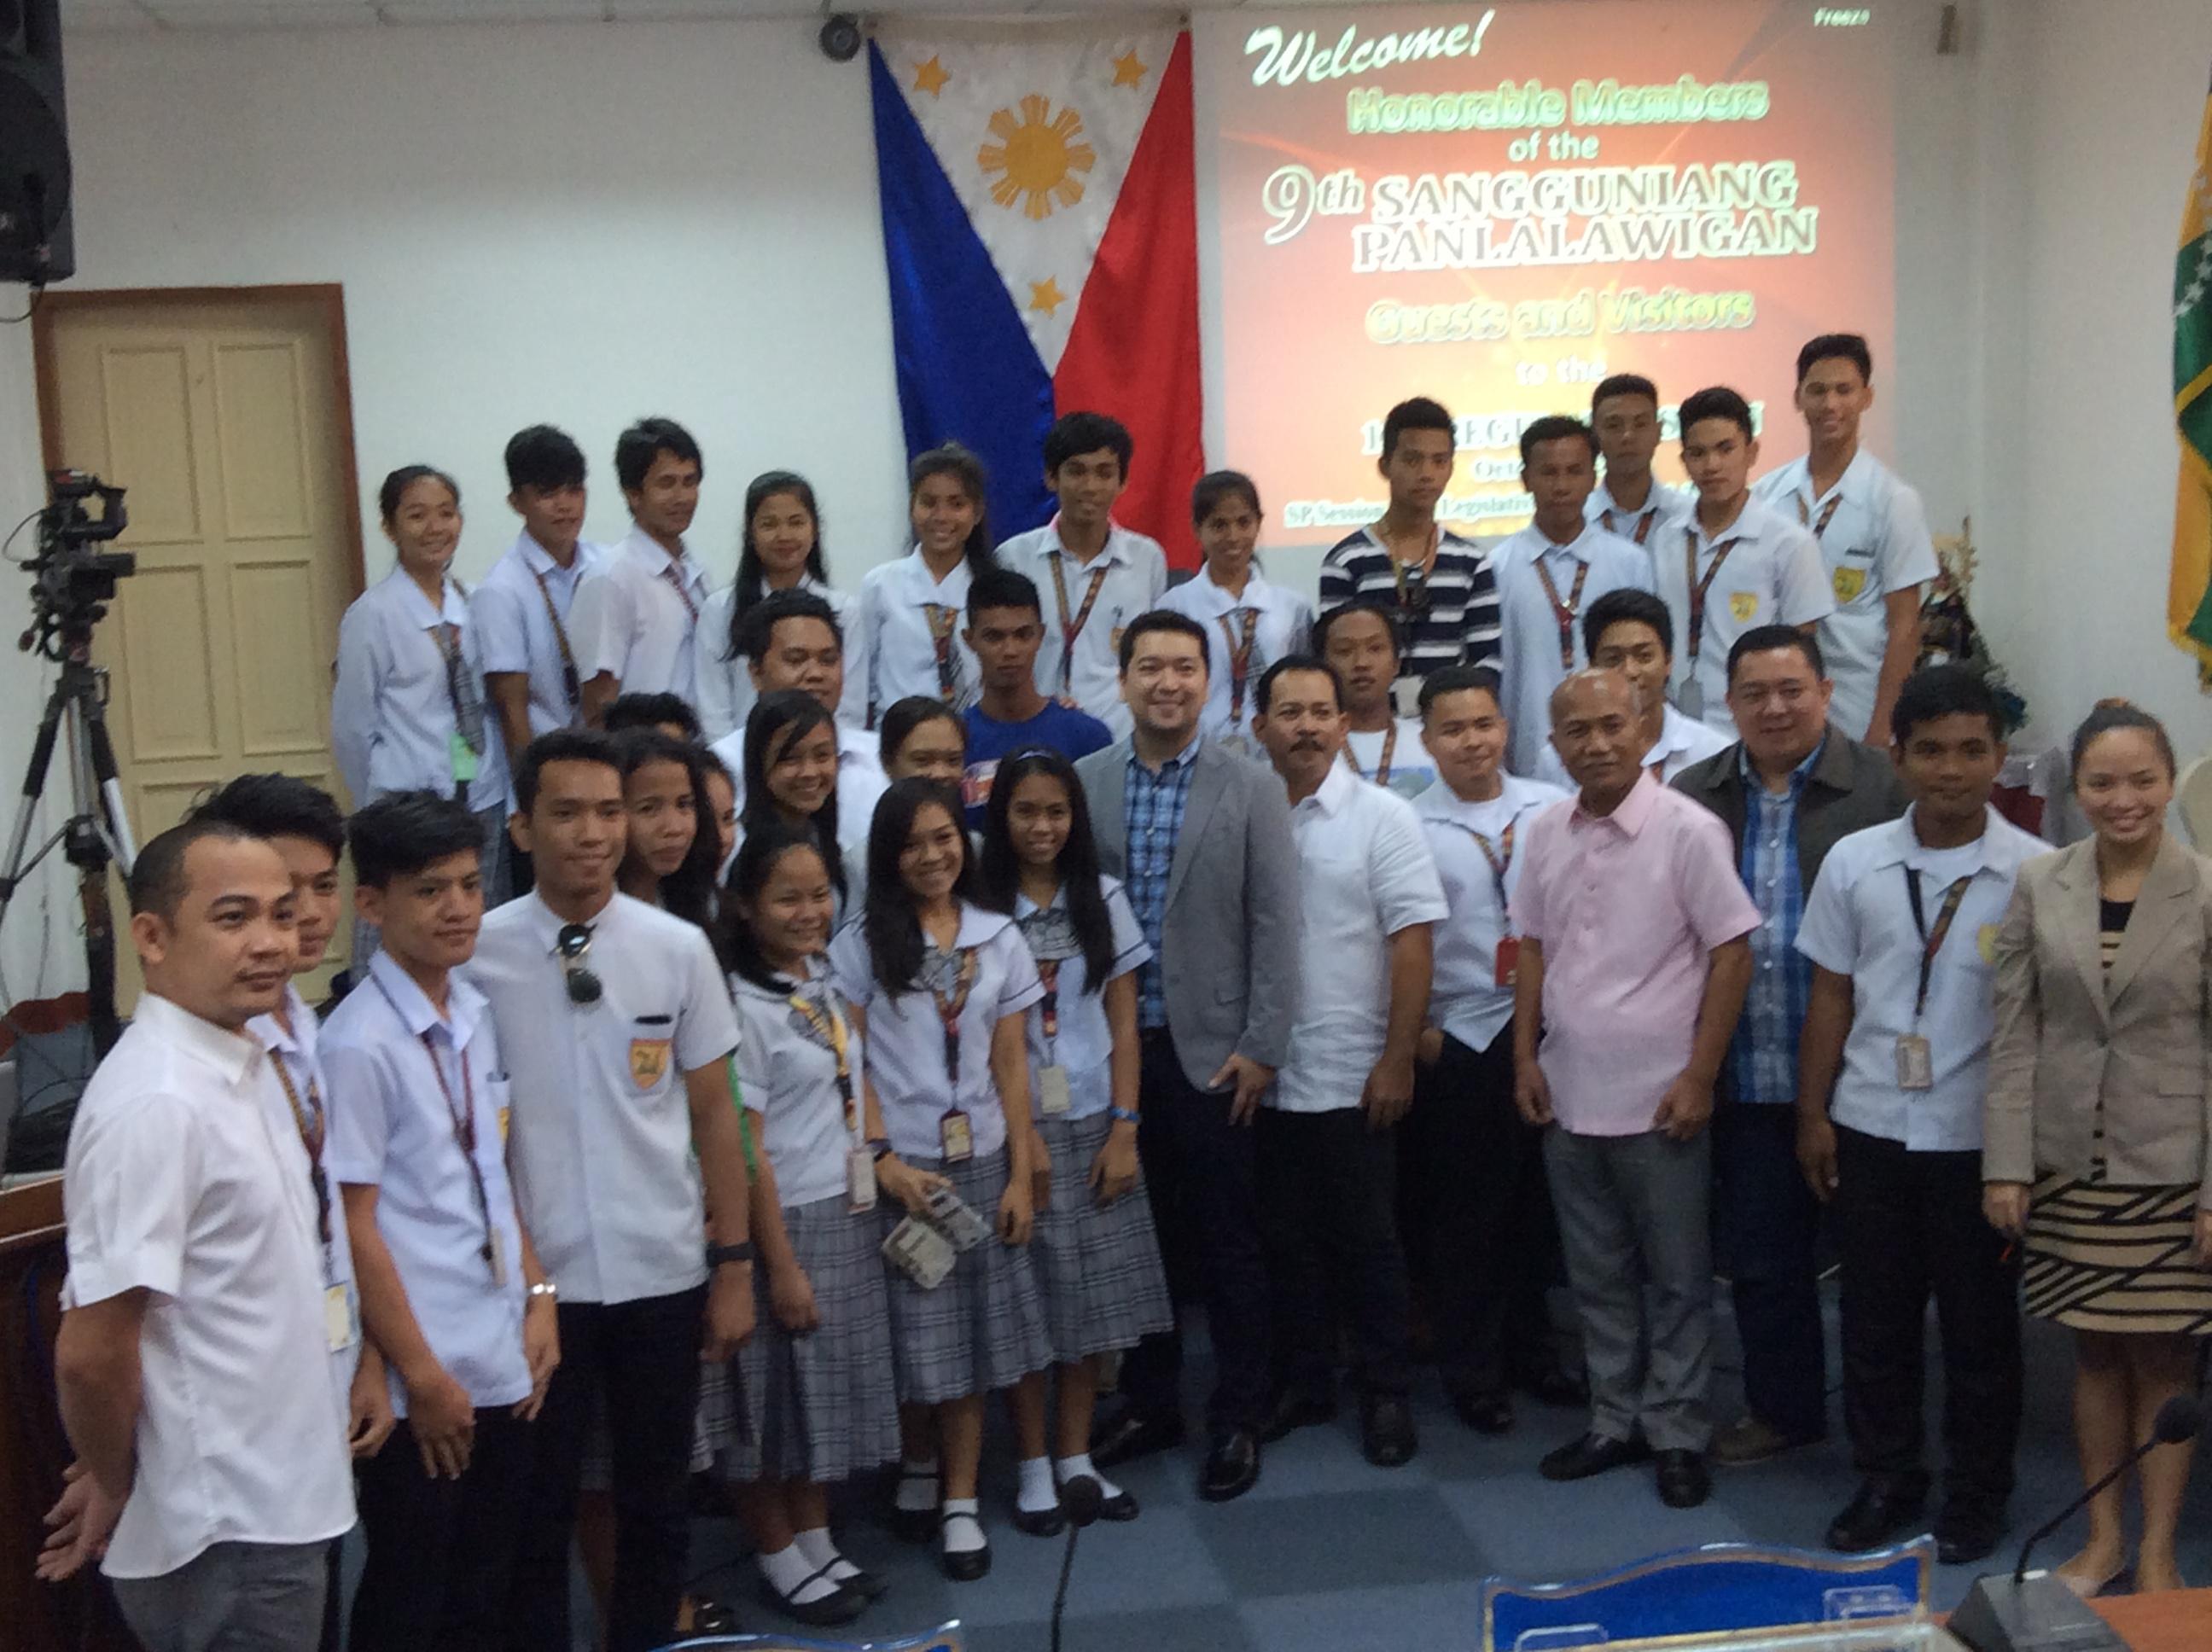 BBK20161005-CagayuanBoardMembers-HighSchoolTeenPenny-GroupShot